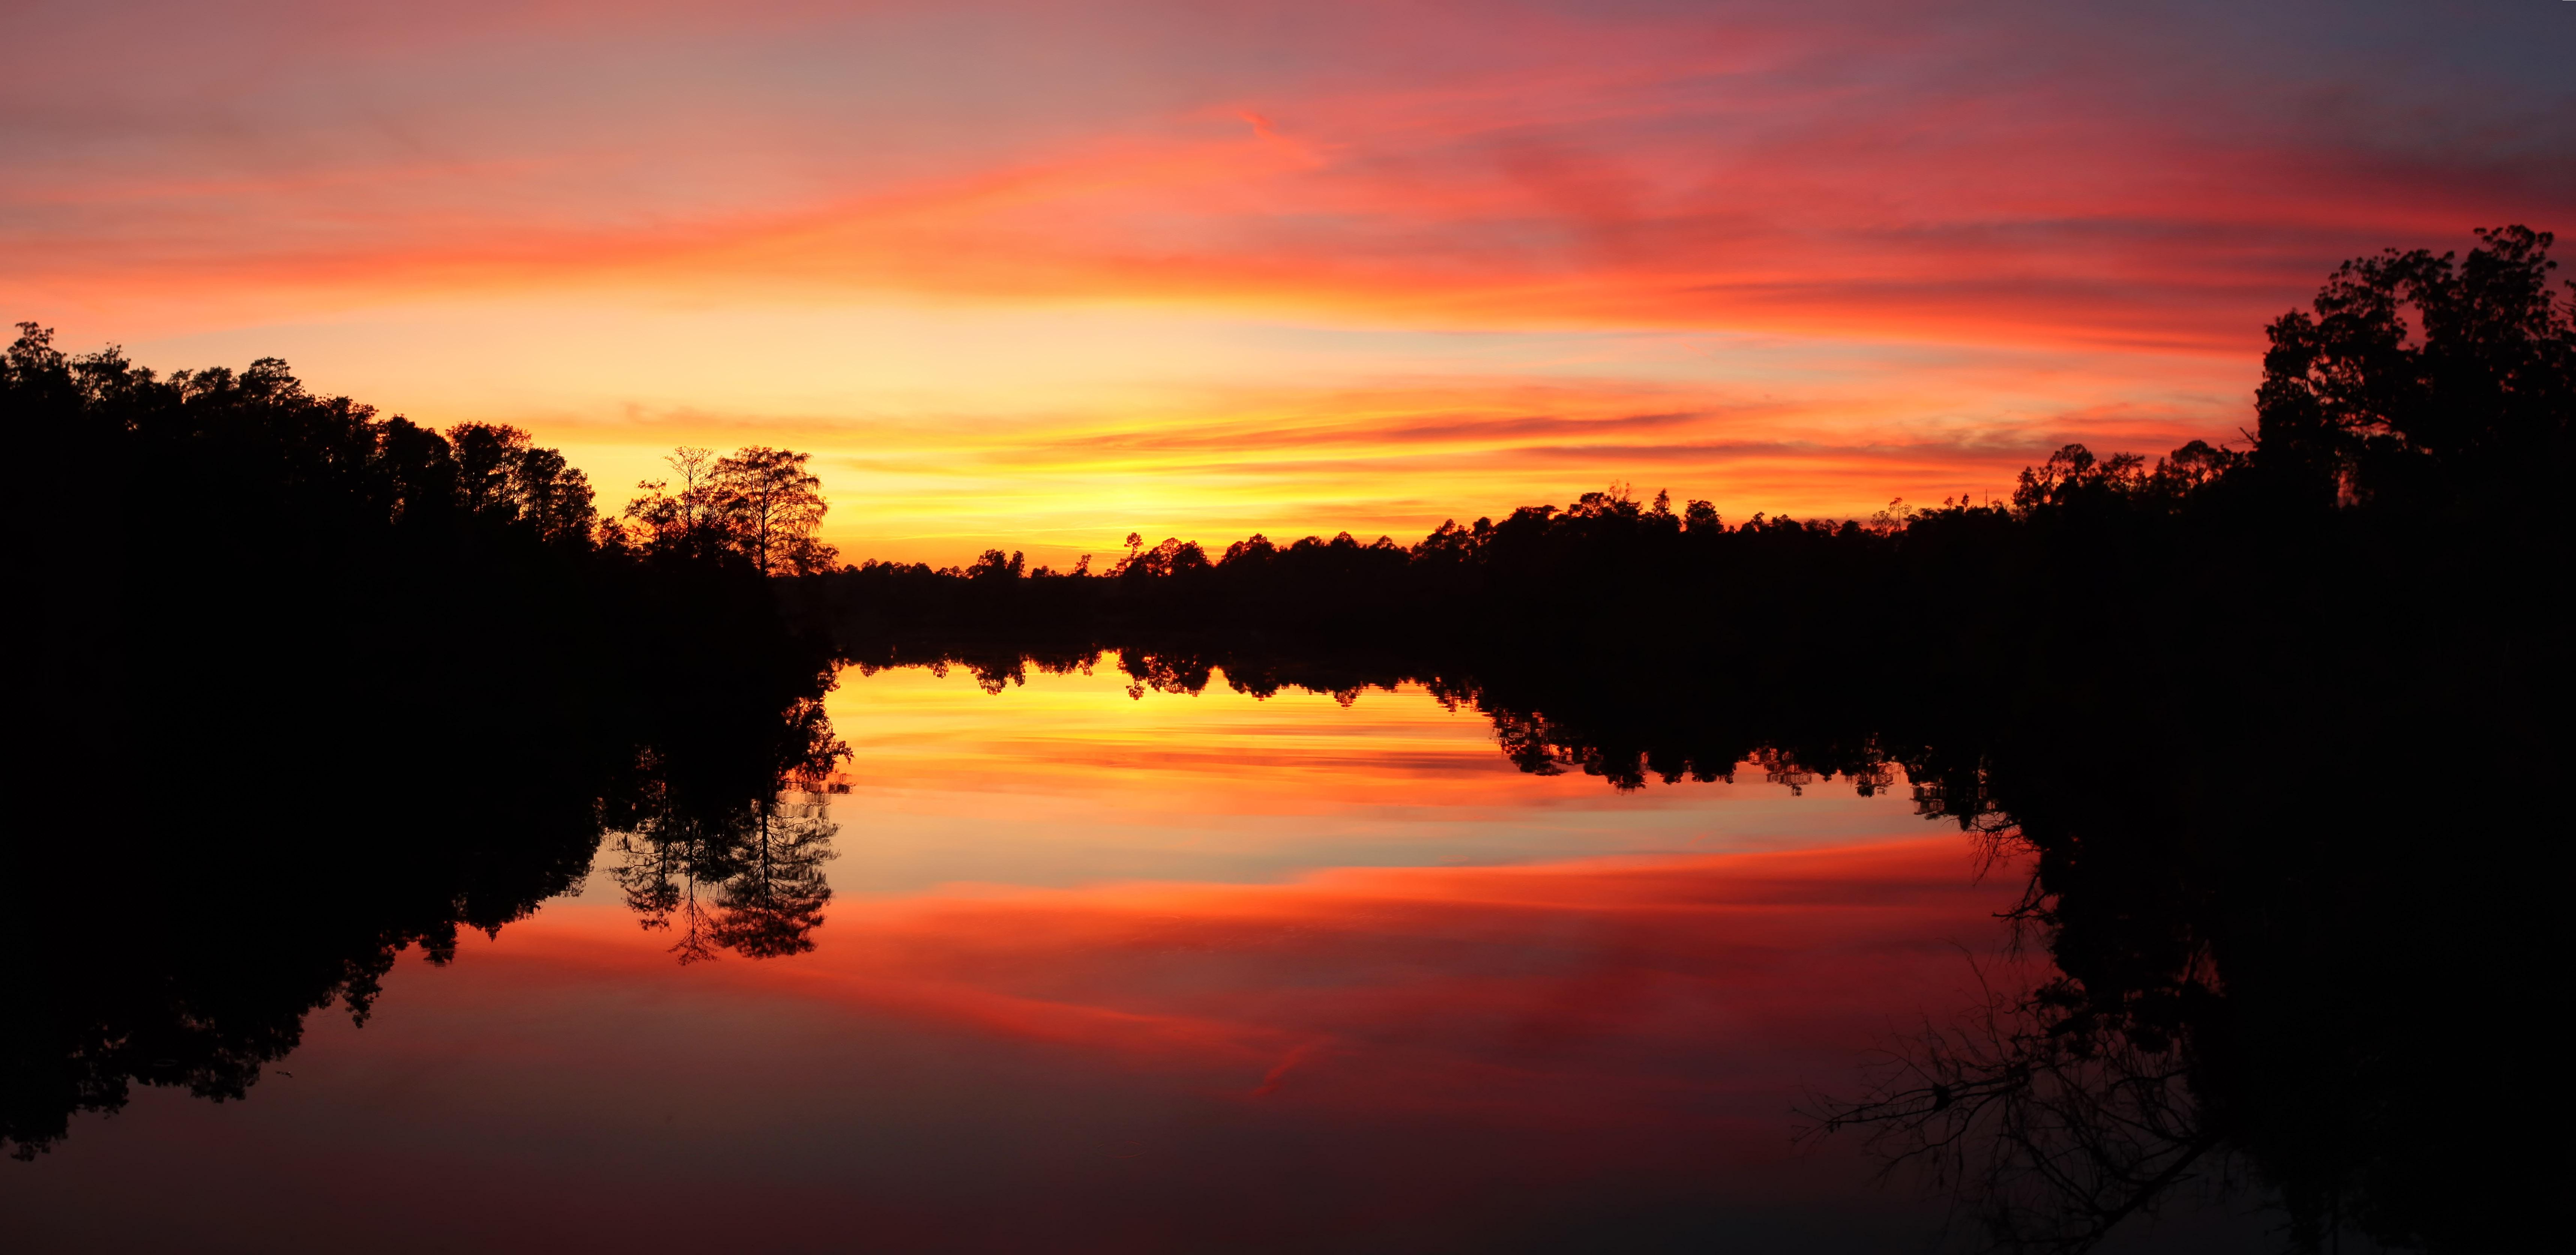 Sunset at river photo